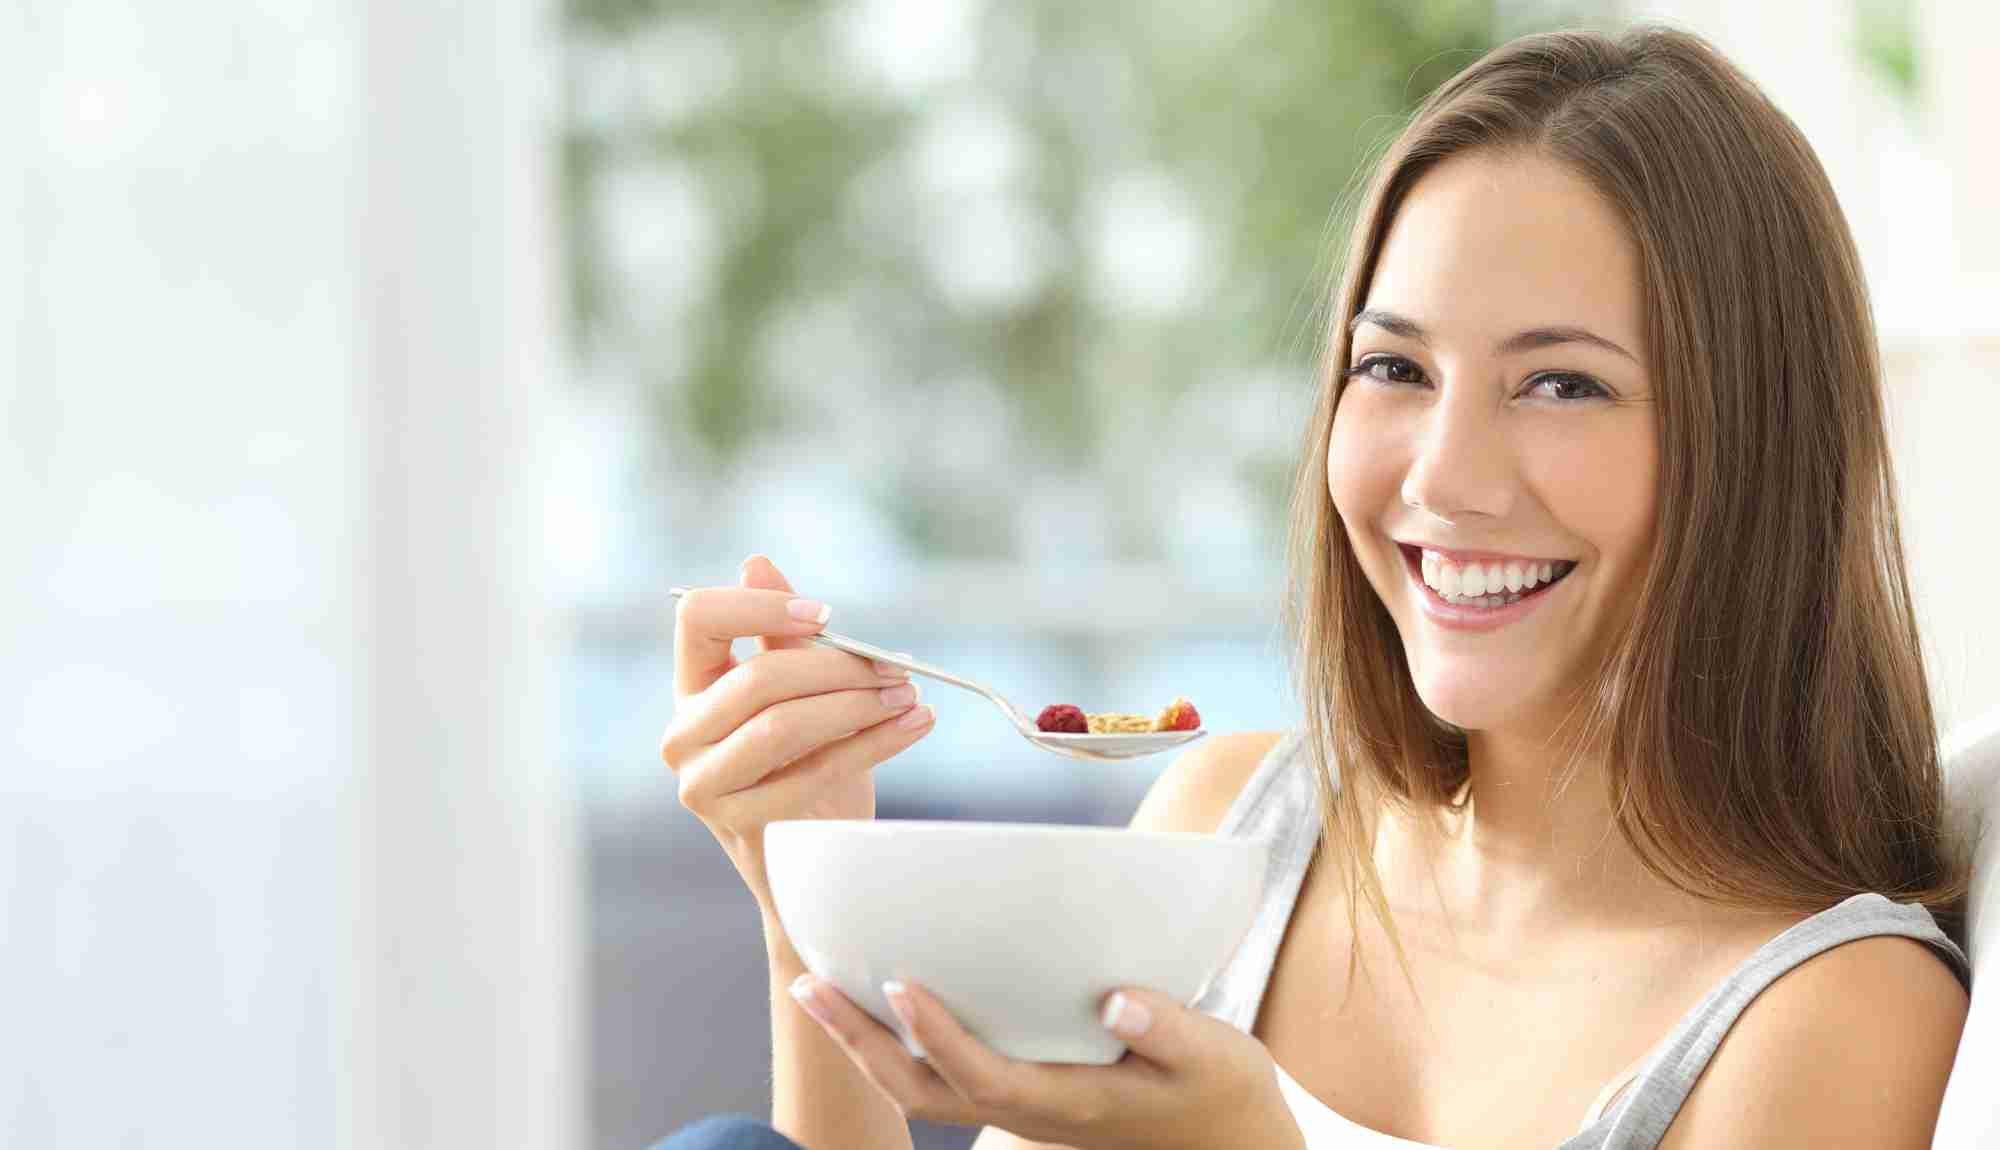 Dieta para engordar mulher